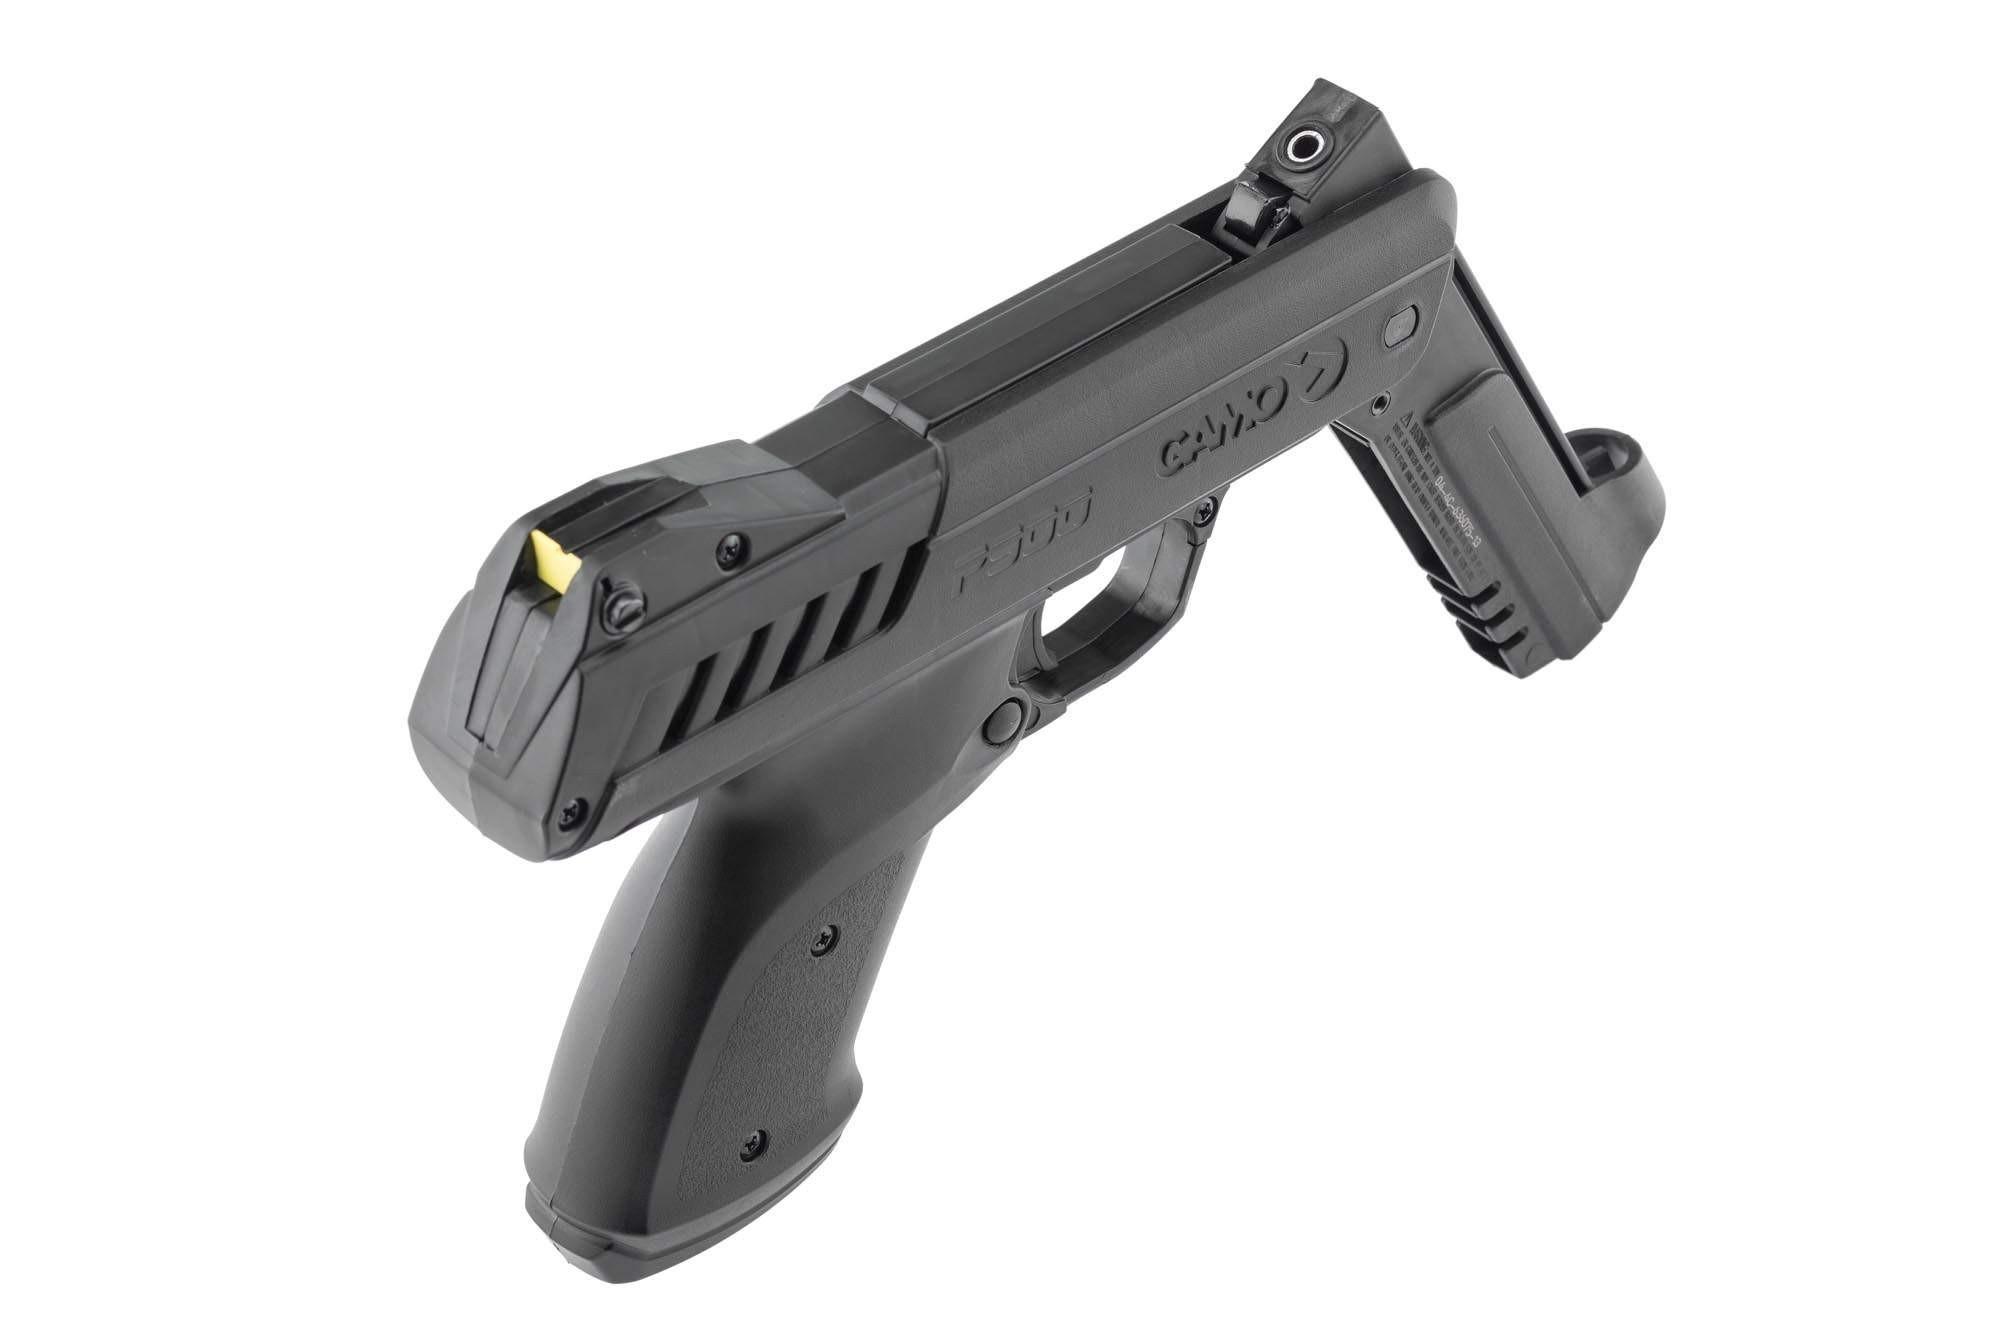 pistolet air comprim gamo p 900 cal 4 5 mm pistolets air comprim co2 made in chasse. Black Bedroom Furniture Sets. Home Design Ideas